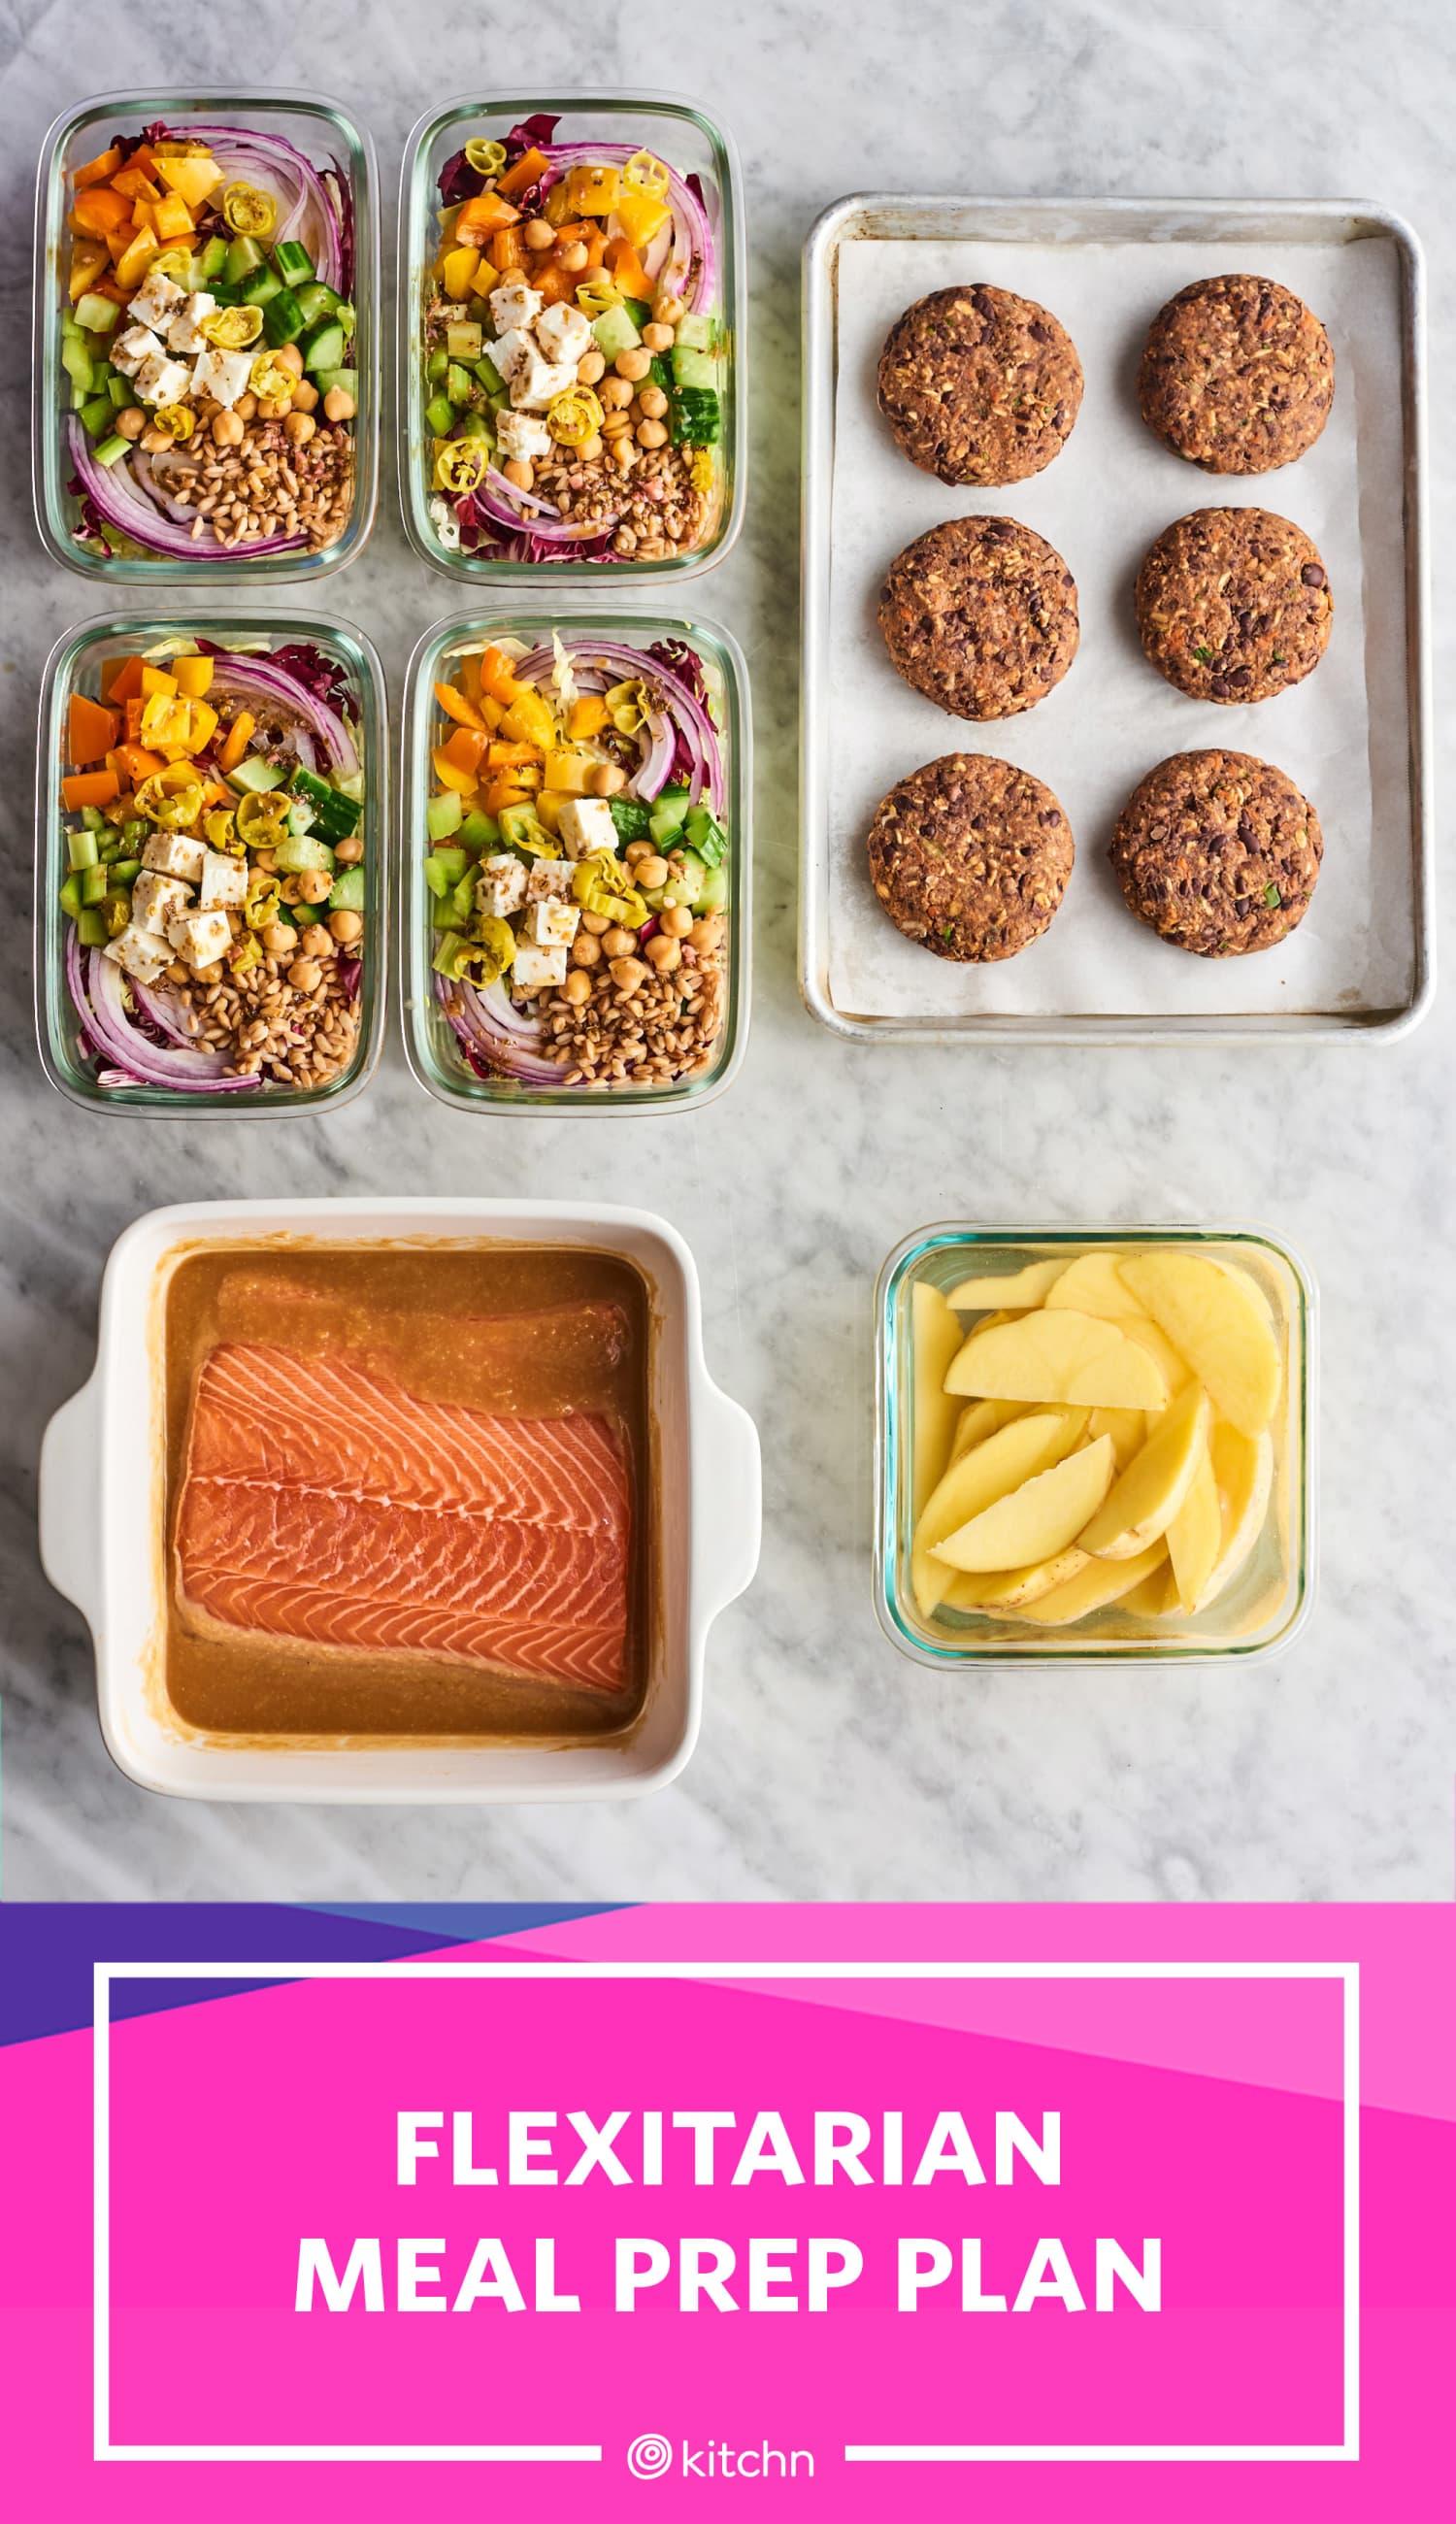 Meal Prep Plan: How I Prep a Week of Easy Flexitarian Meals